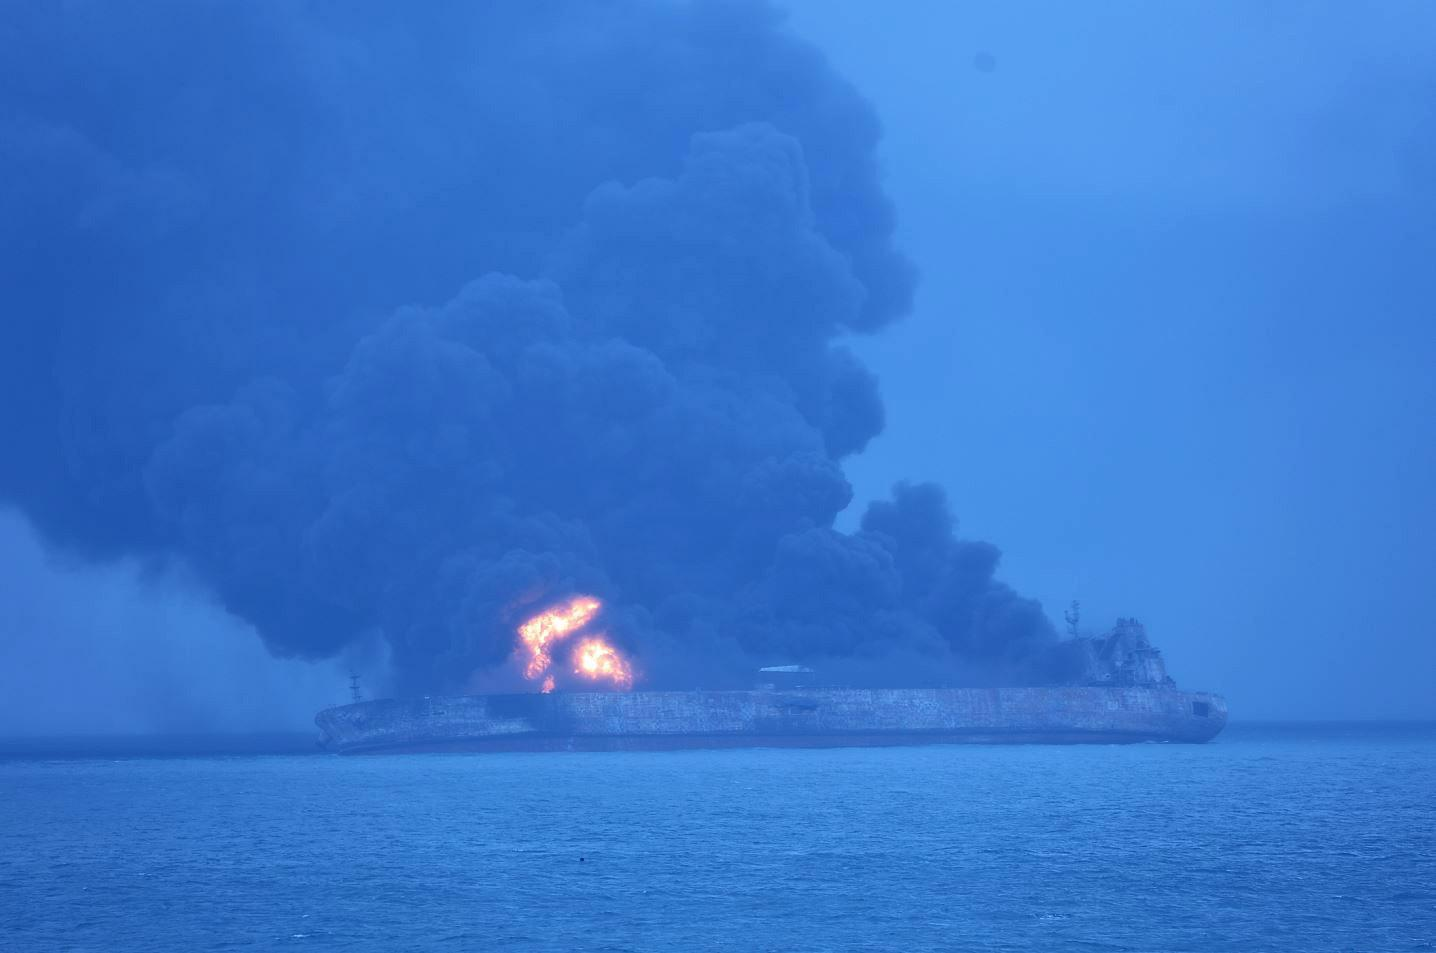 Cina: recuperata prima vittima nave Iran